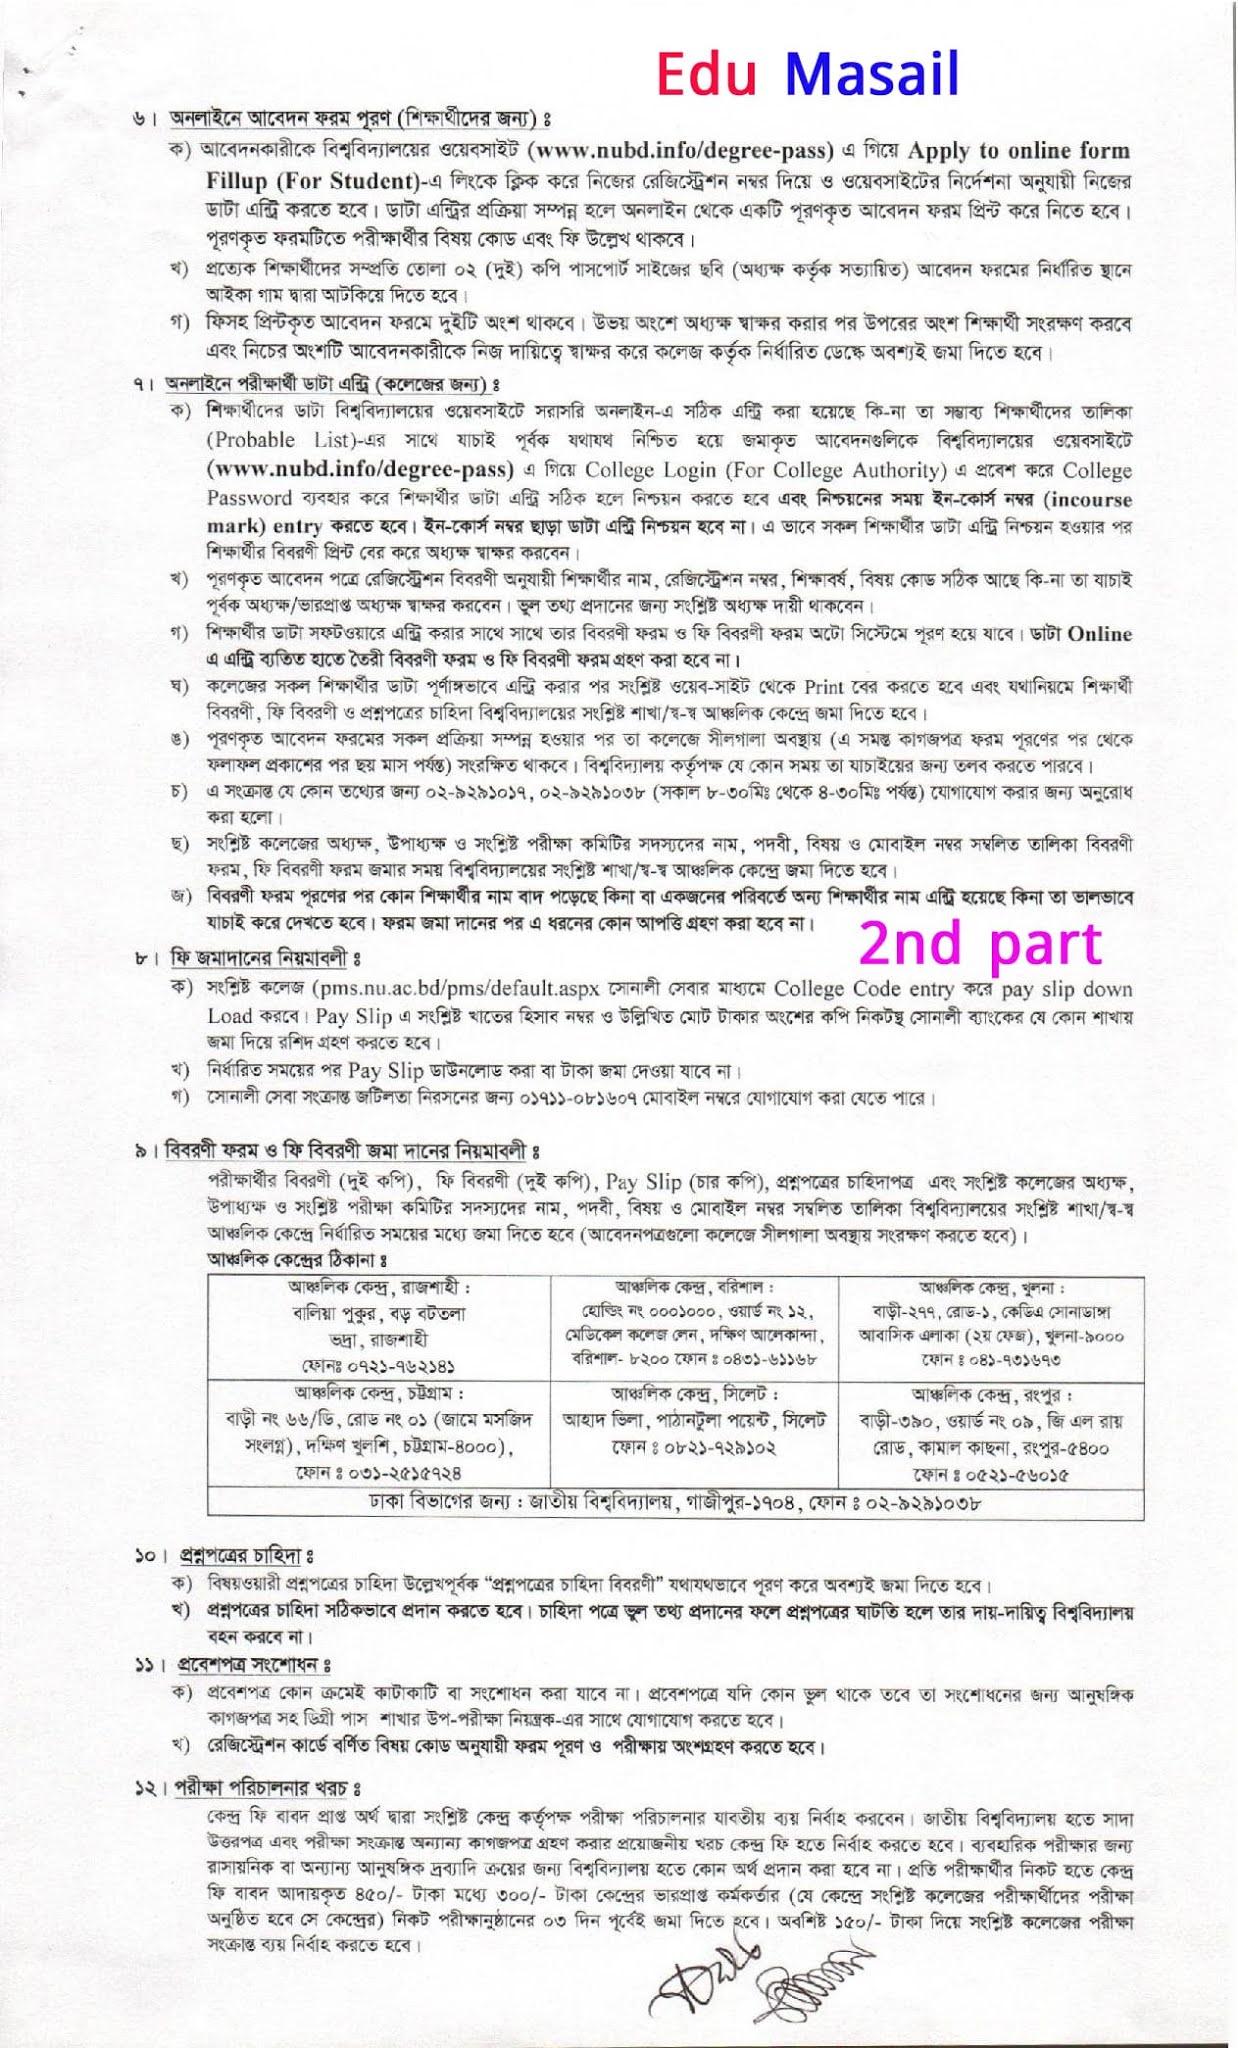 degree 3rd year form fillup 2021 - part 2 - edu masail